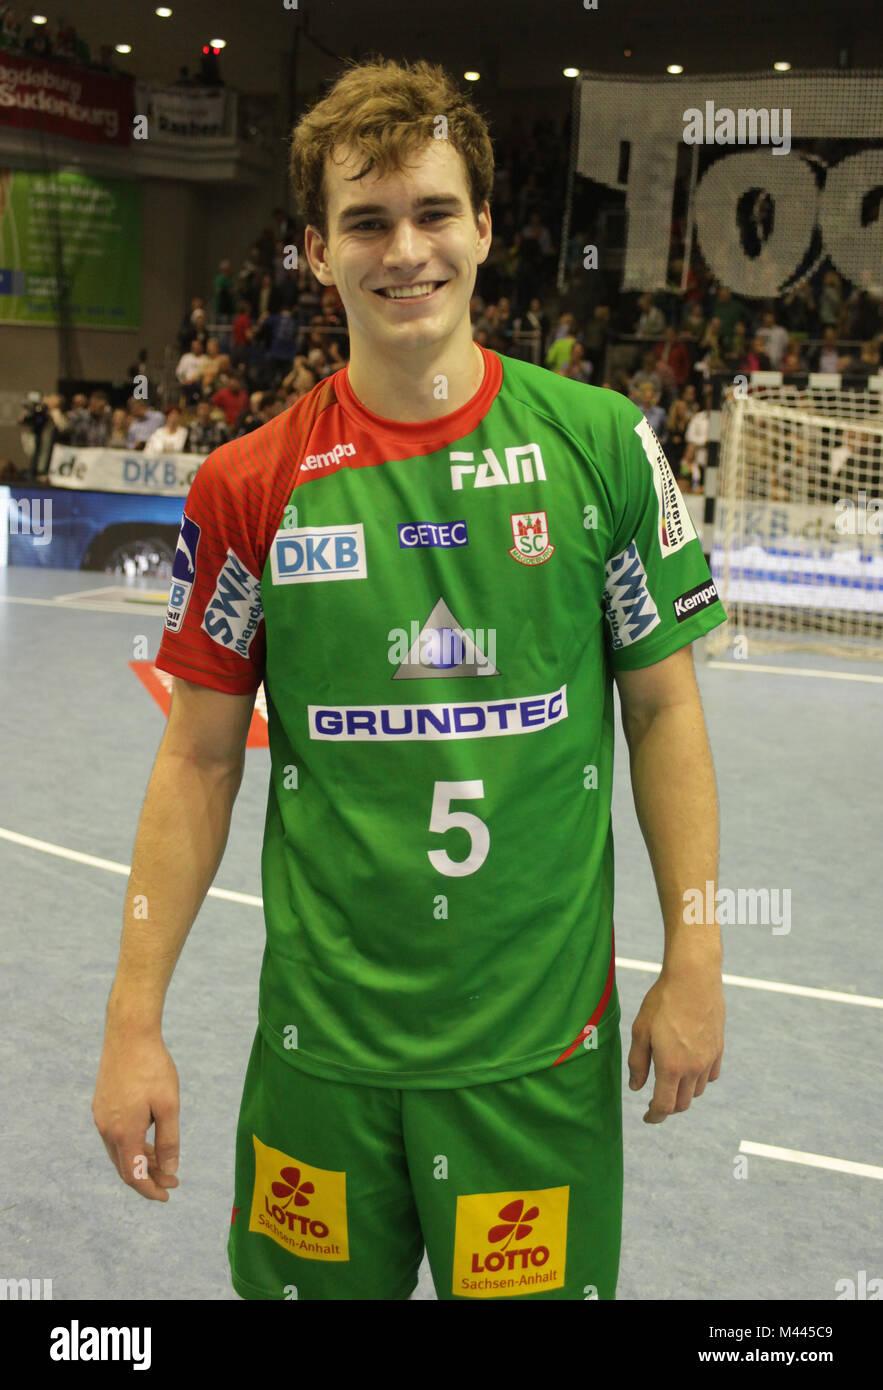 deutscher Handballspieler Maximillian Janke -Saison 2013/14 SC Magdeburg - Stock Image